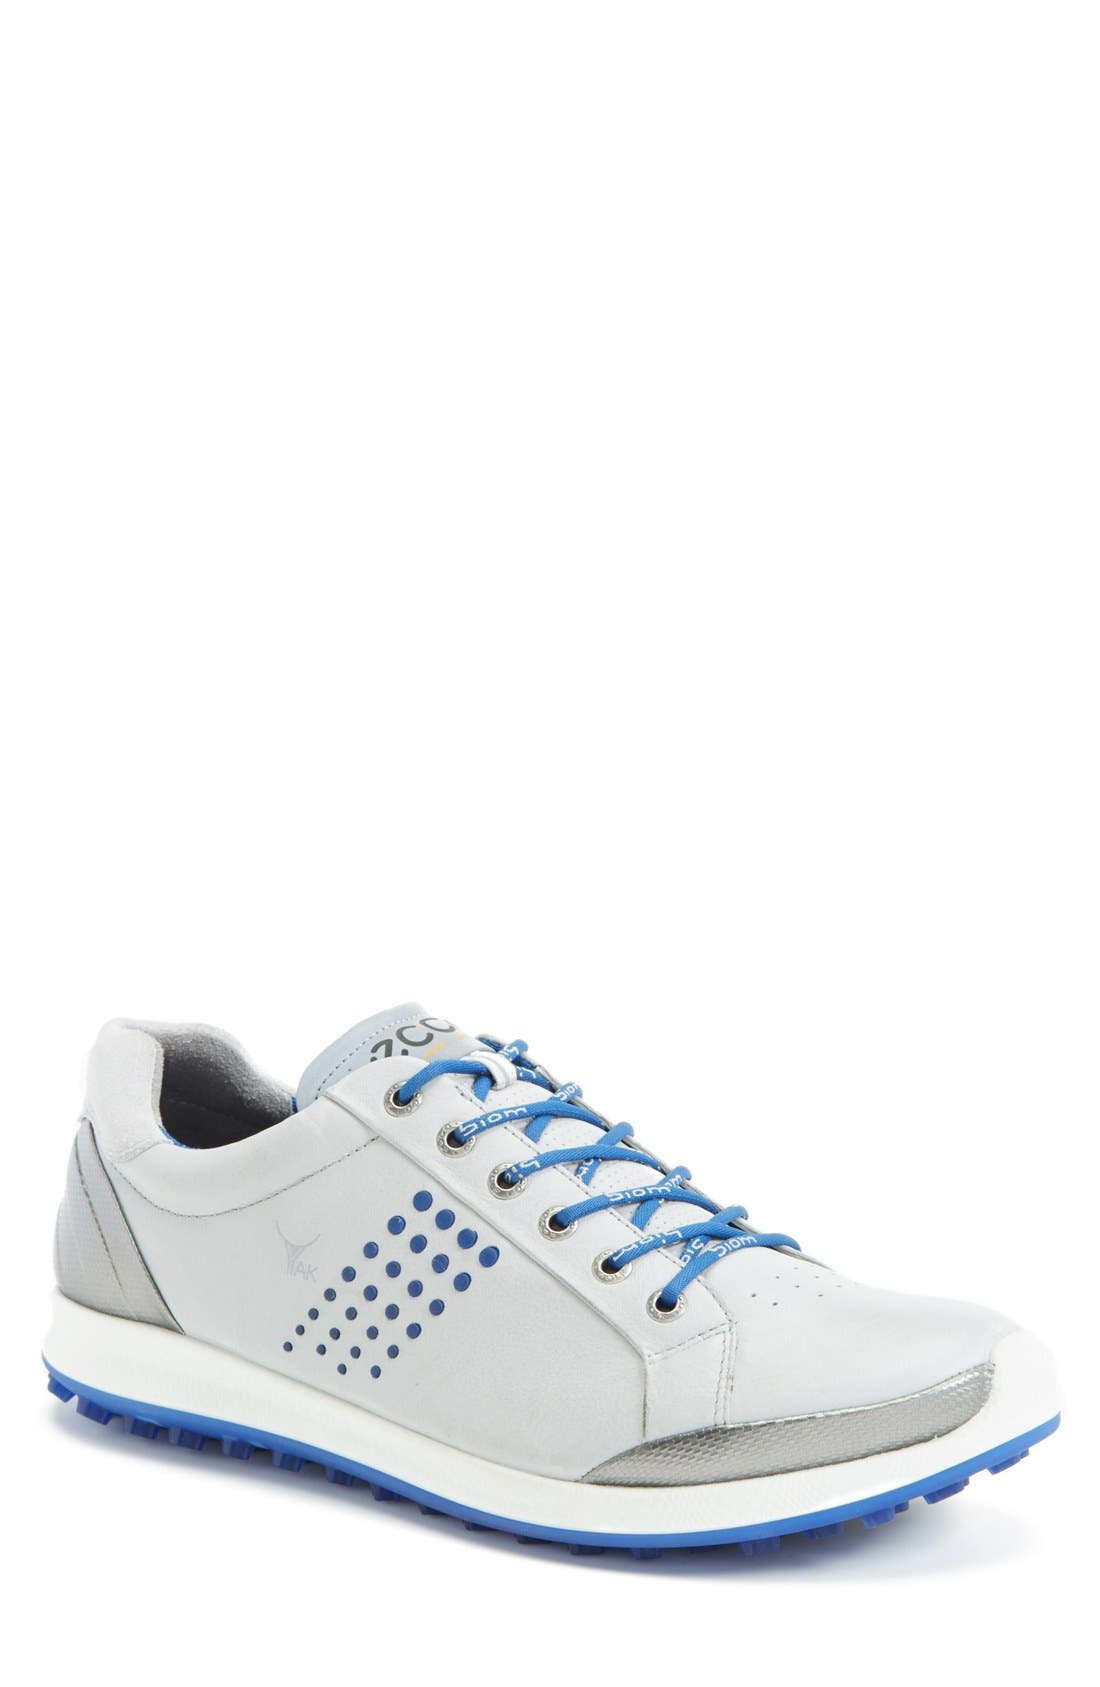 BIOM Hybrid 2 Golf Shoe,                             Main thumbnail 1, color,                             Concrete/ Royal